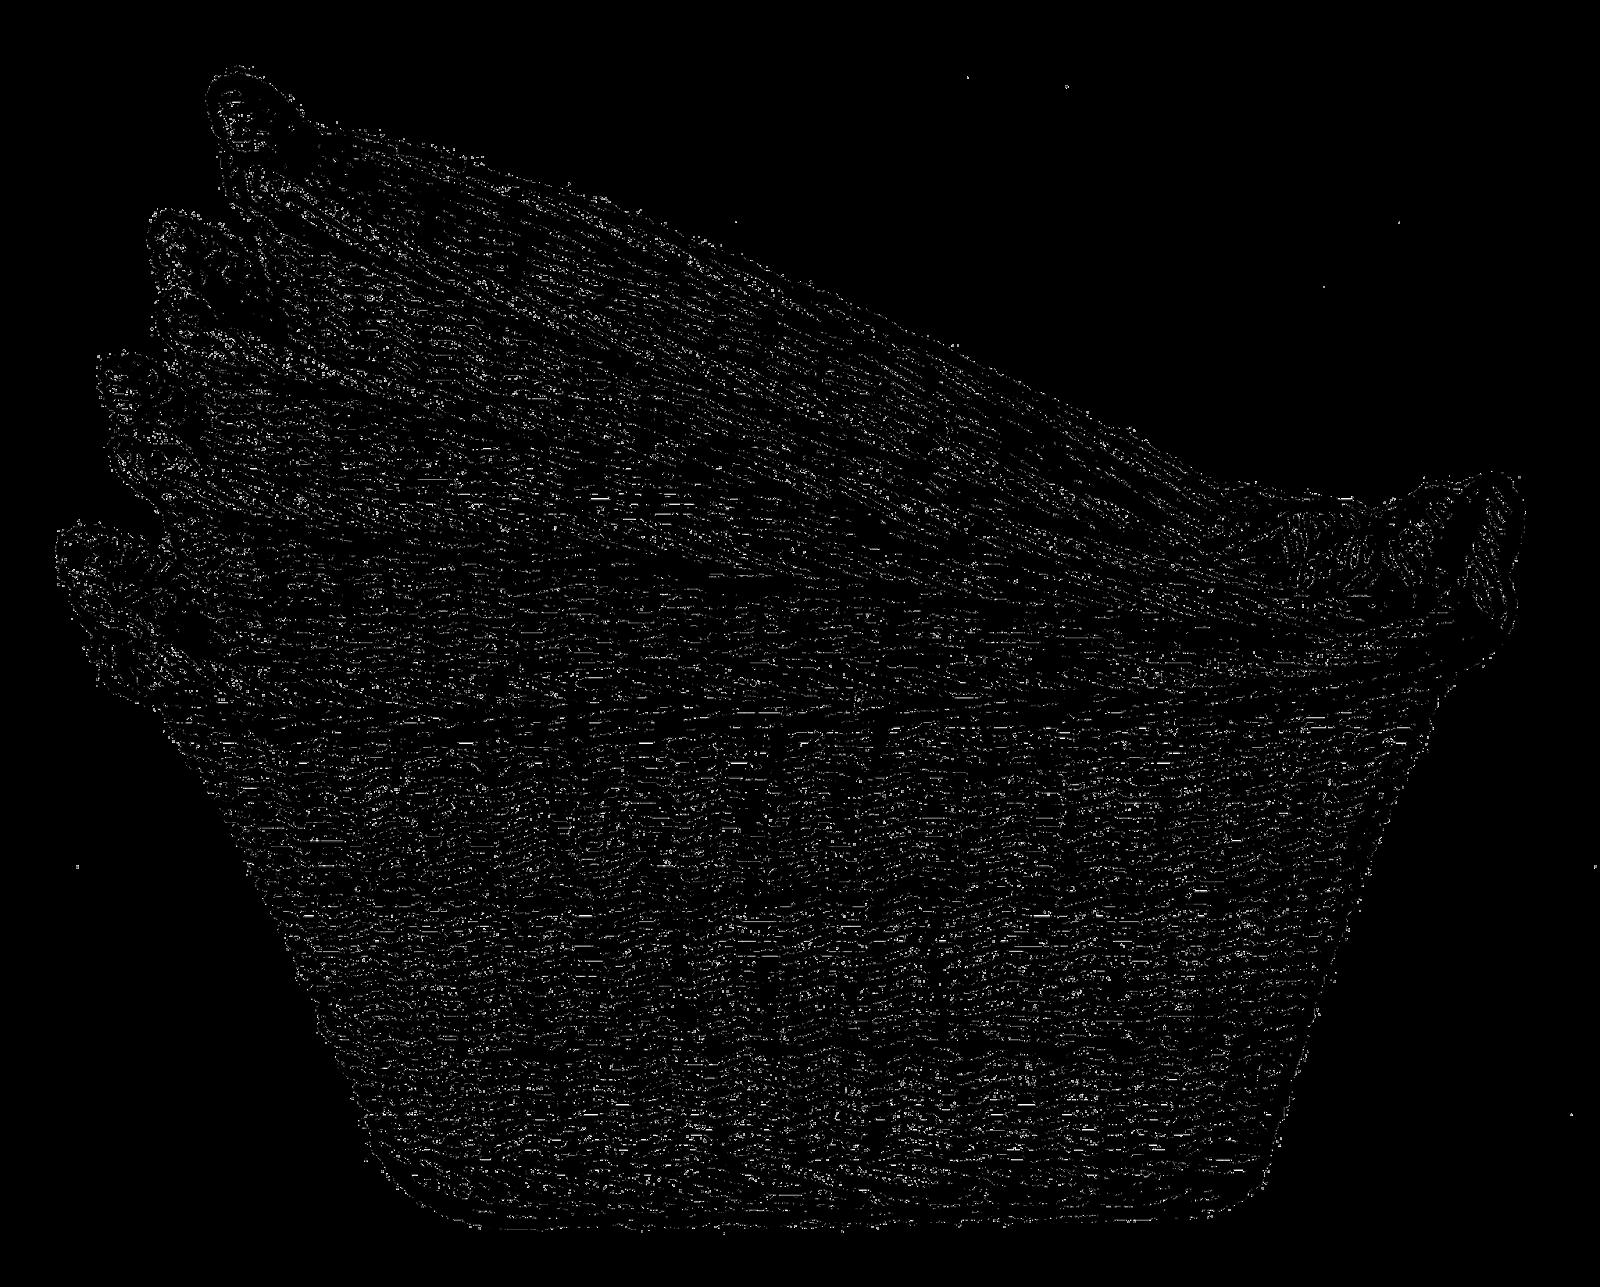 Art Basket Images : Antique images digital clip art of wicker laundry